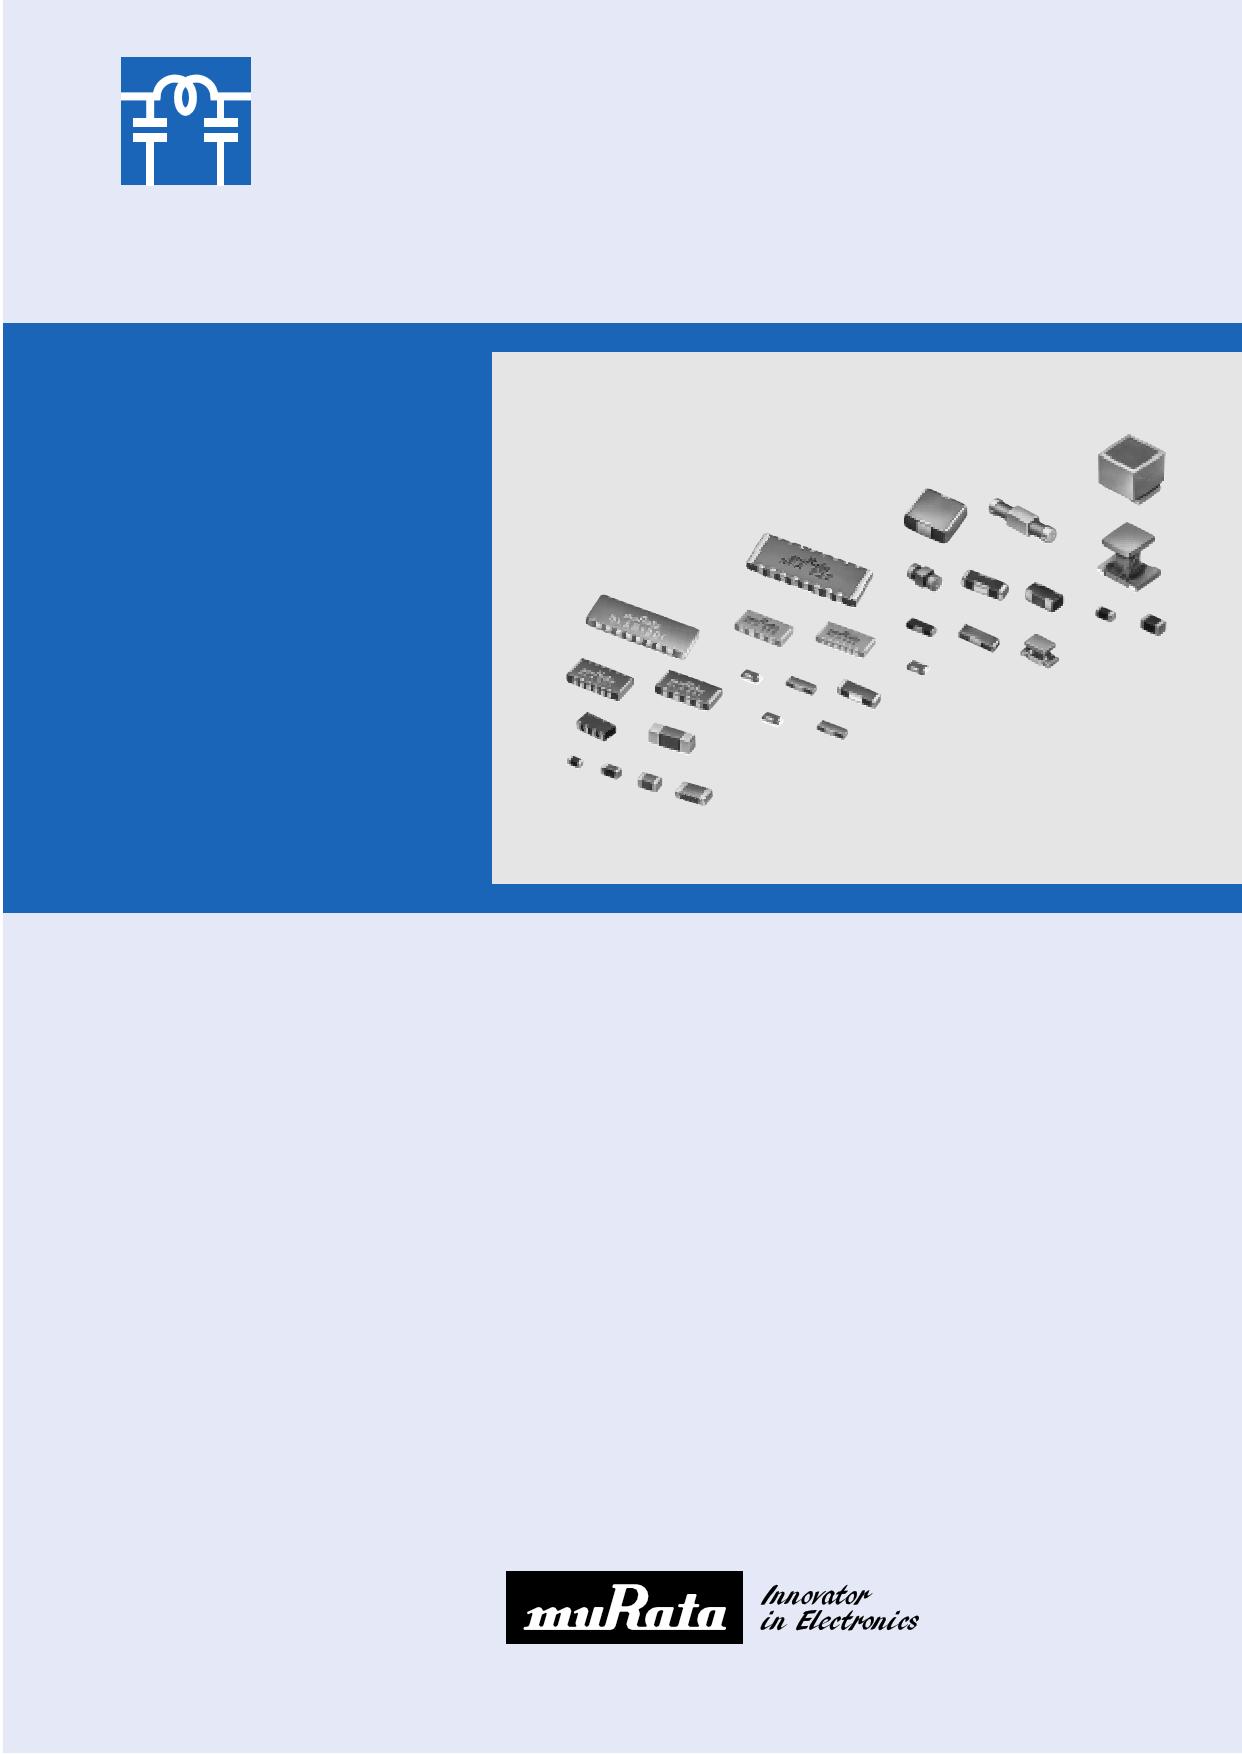 NFM41R11C222 datasheet pinout